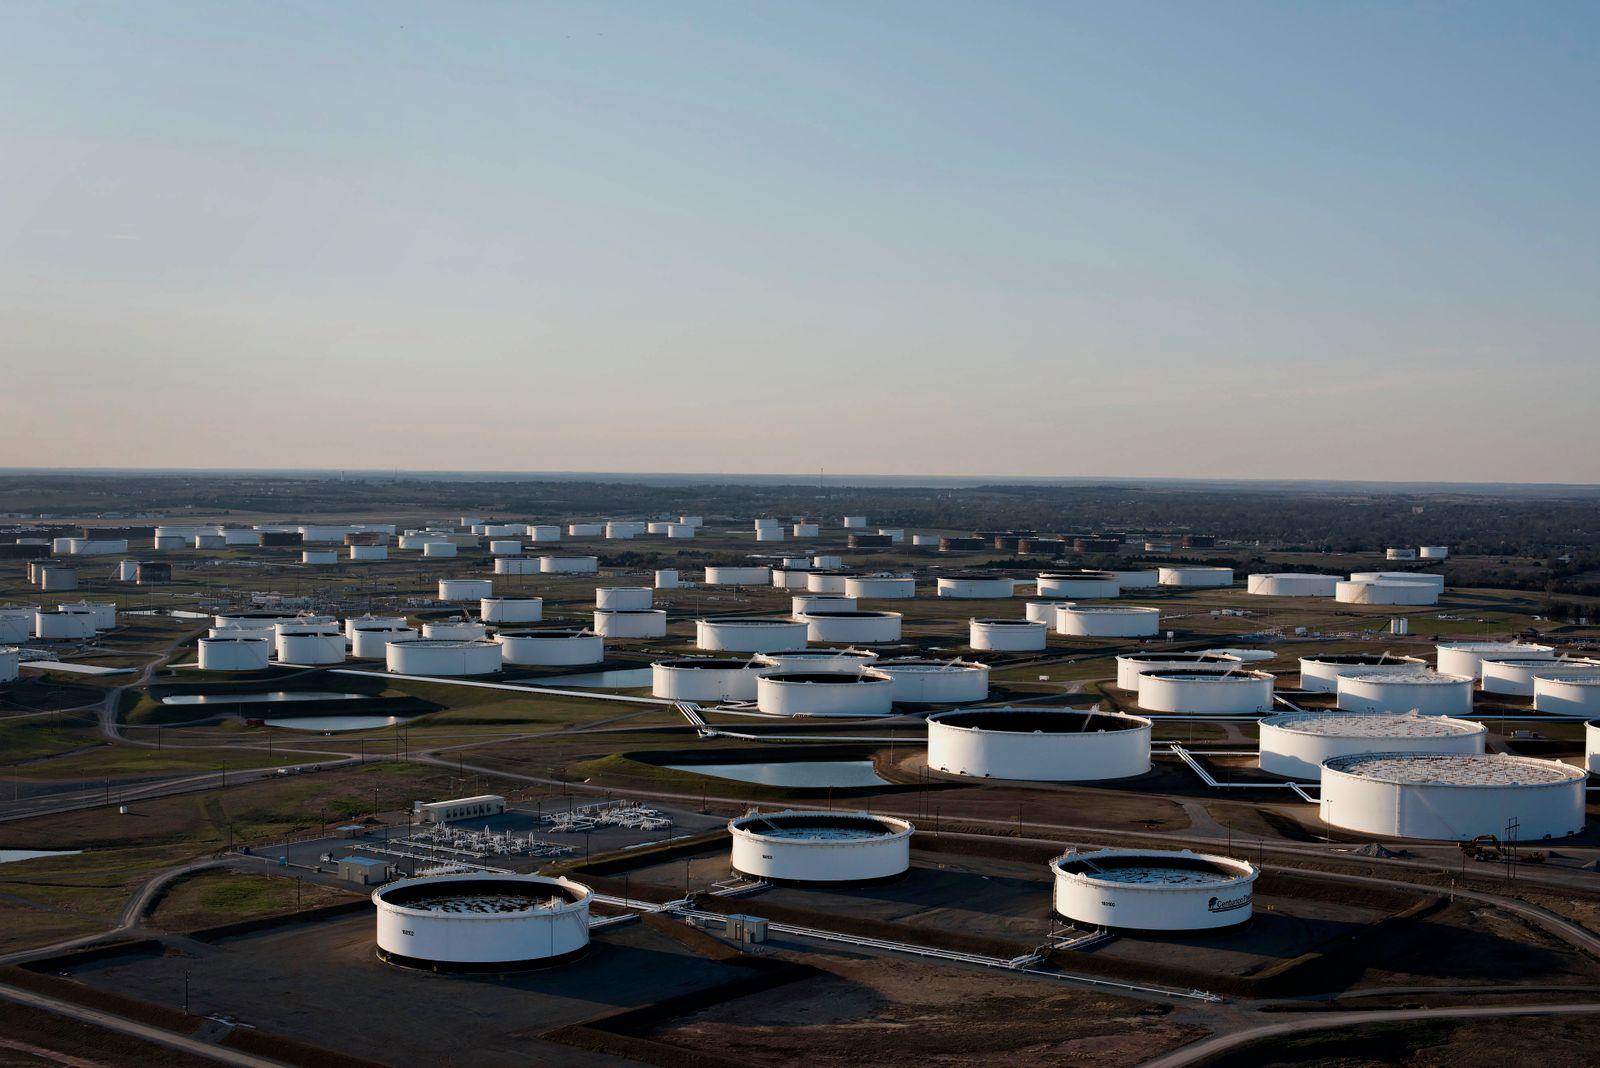 Aerial Views Of Largest U.S. Oil Hub As Stockpile Growth Slows